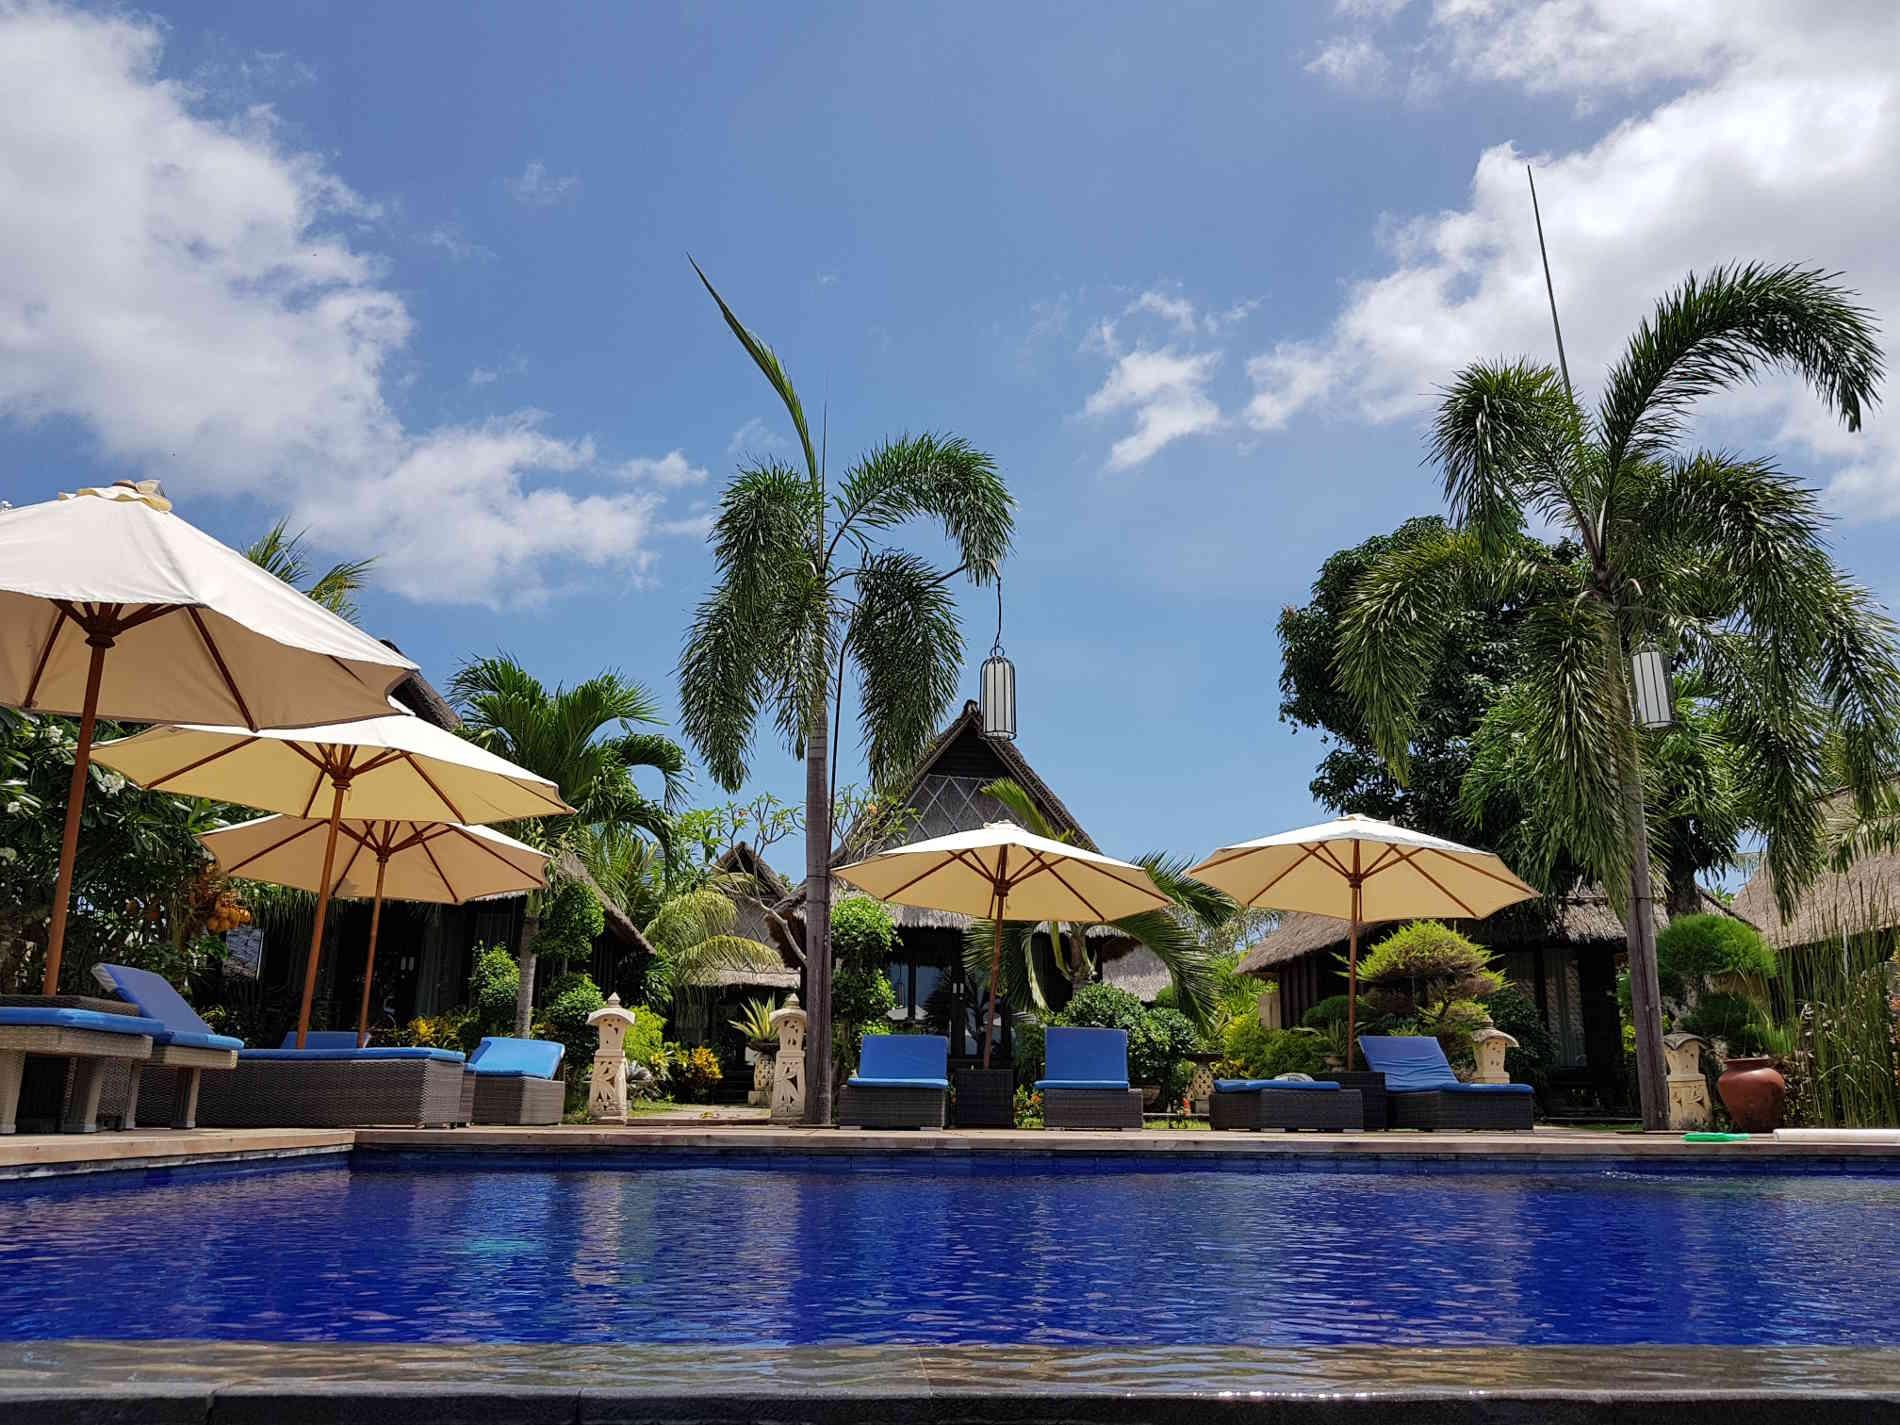 Dove dormire a Bali: la piscina vicino al mare